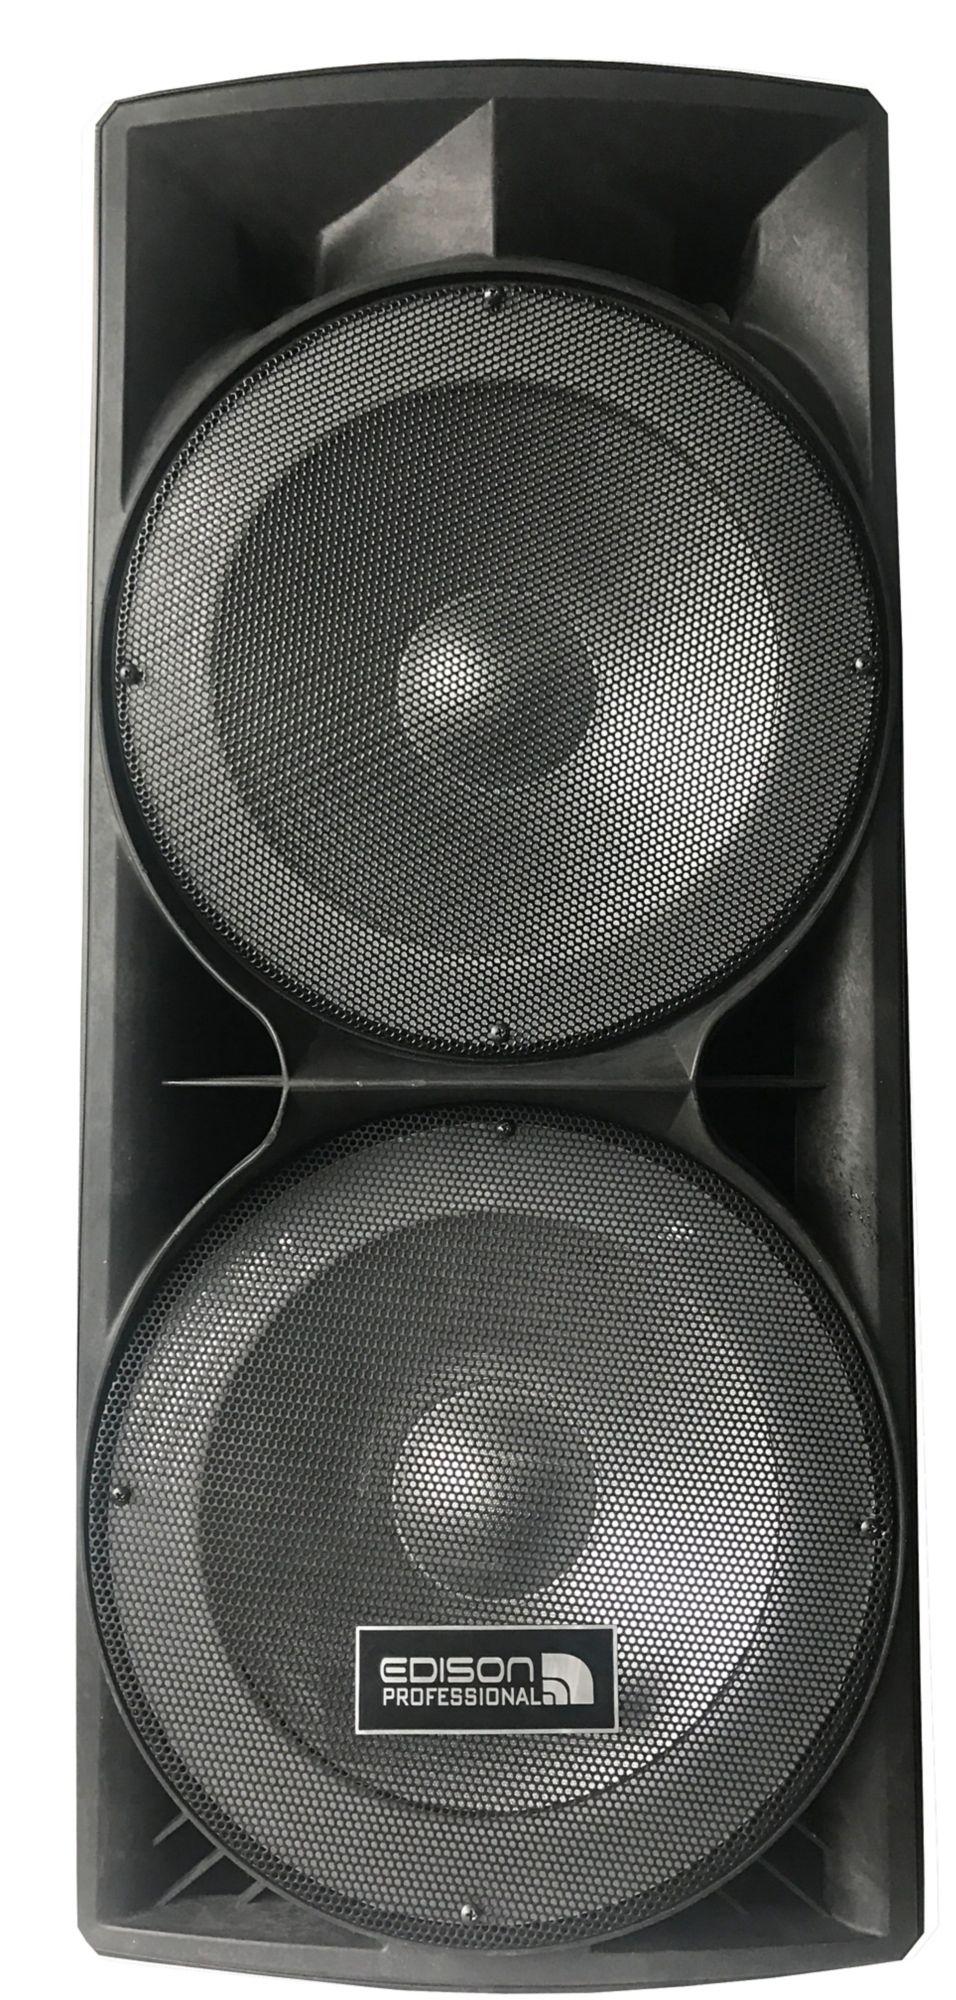 Edison Professional Britelite M 7000 High Power Bluetooth